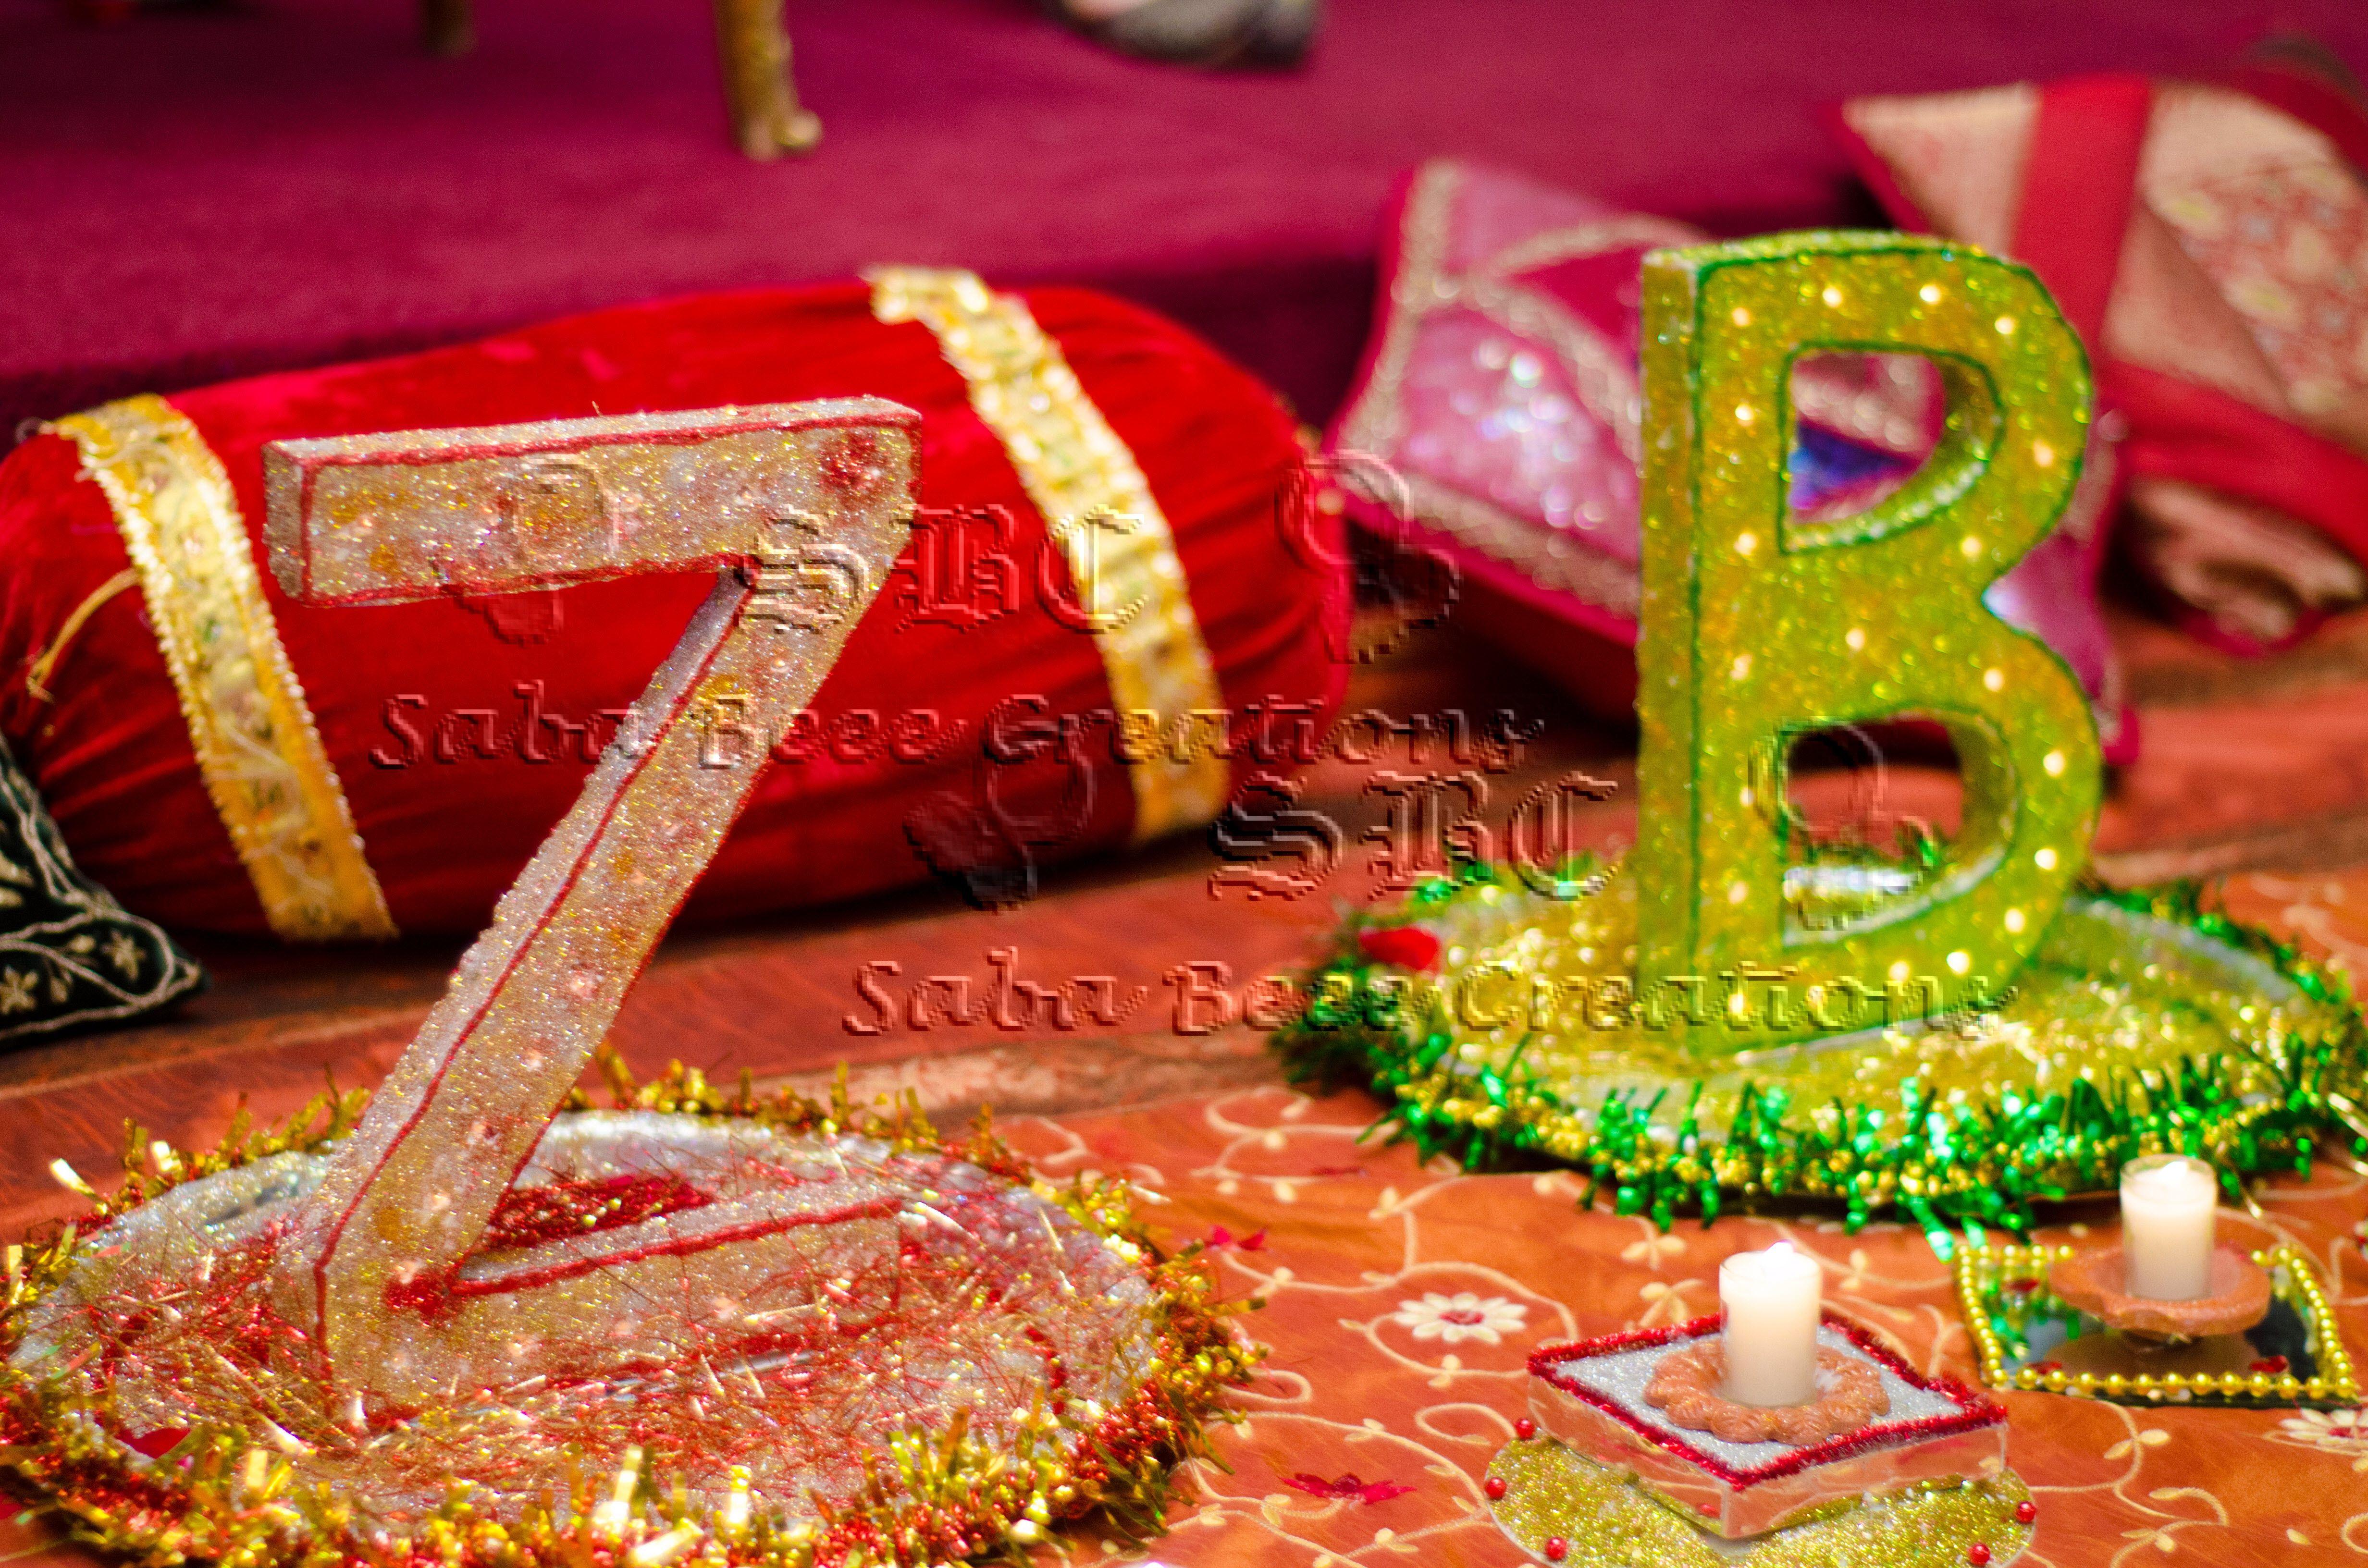 Mehndi Plates Images : Https: www.facebook.com sababeeecreations mehndi thaals